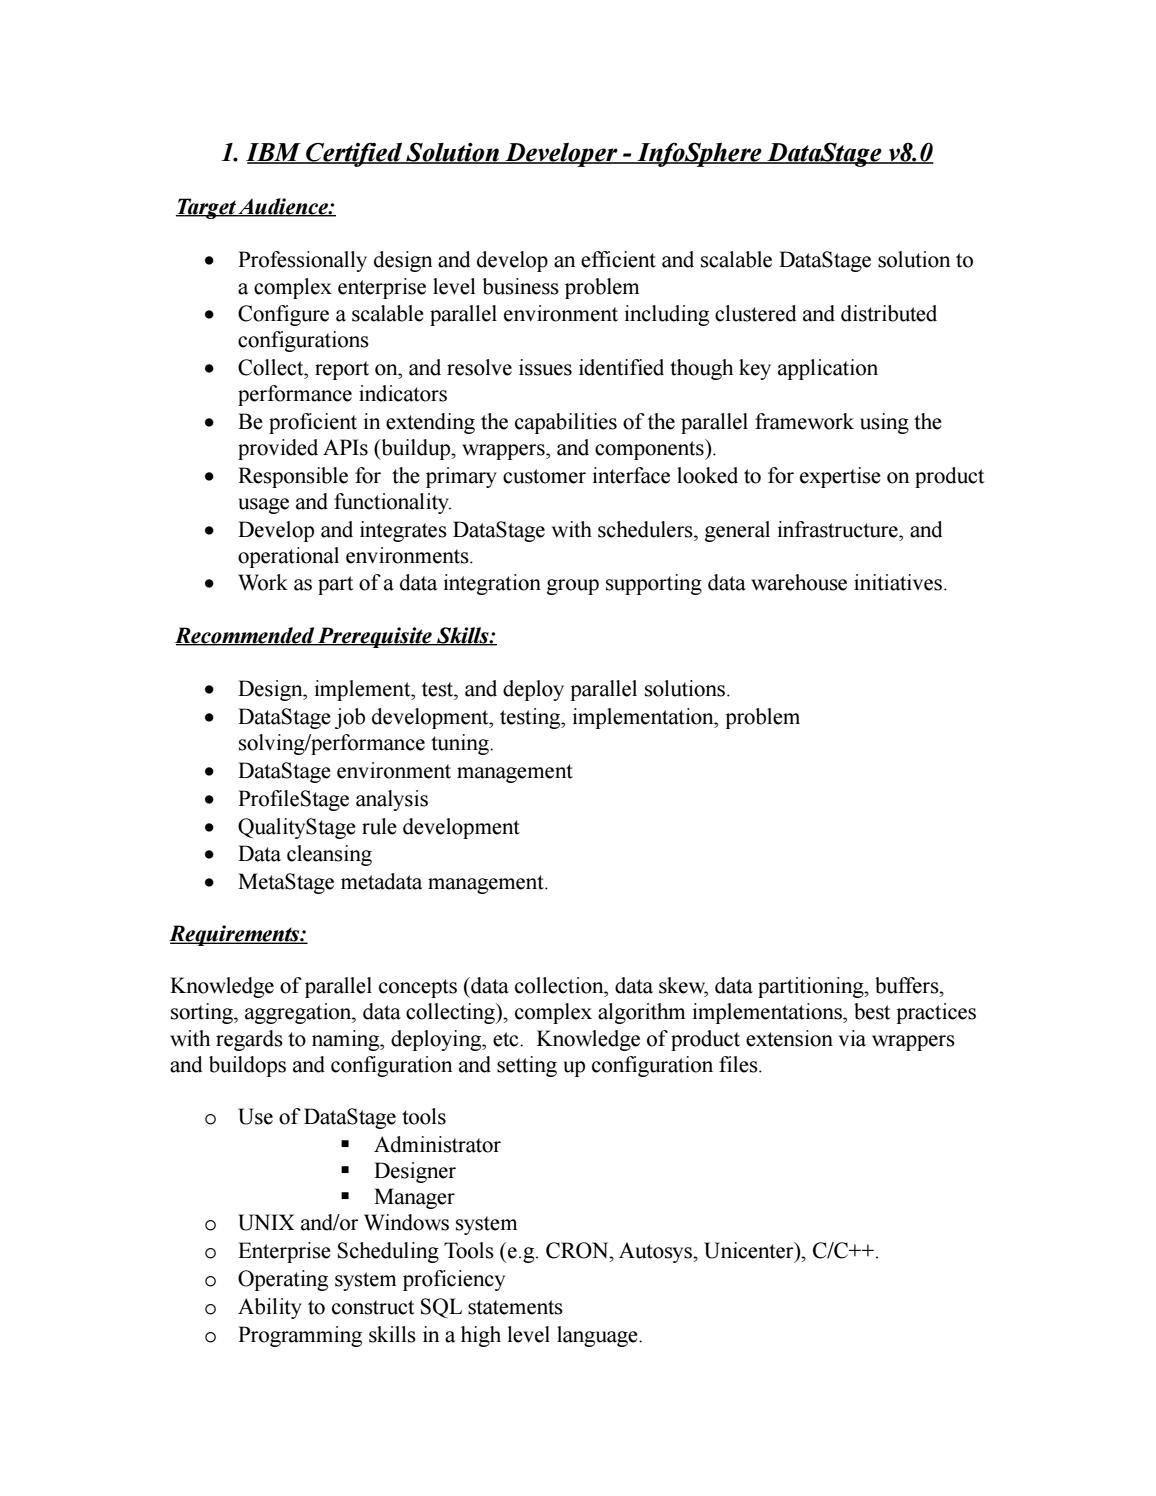 Ibm certified solution developer by vivek kaliyar - issuu